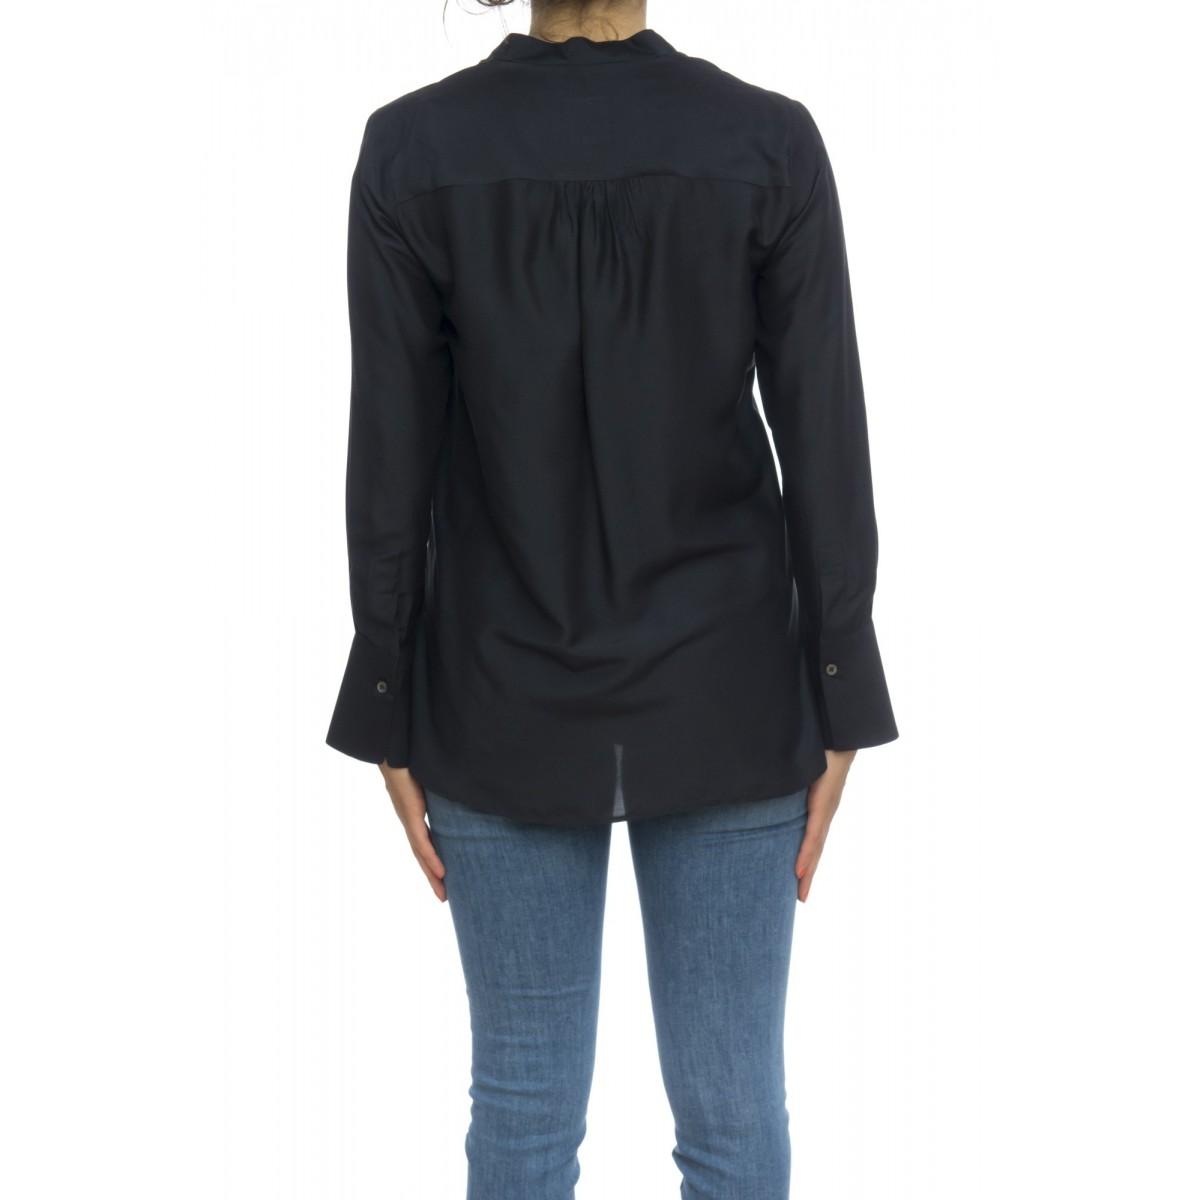 Camicia donna - Luisa 35143